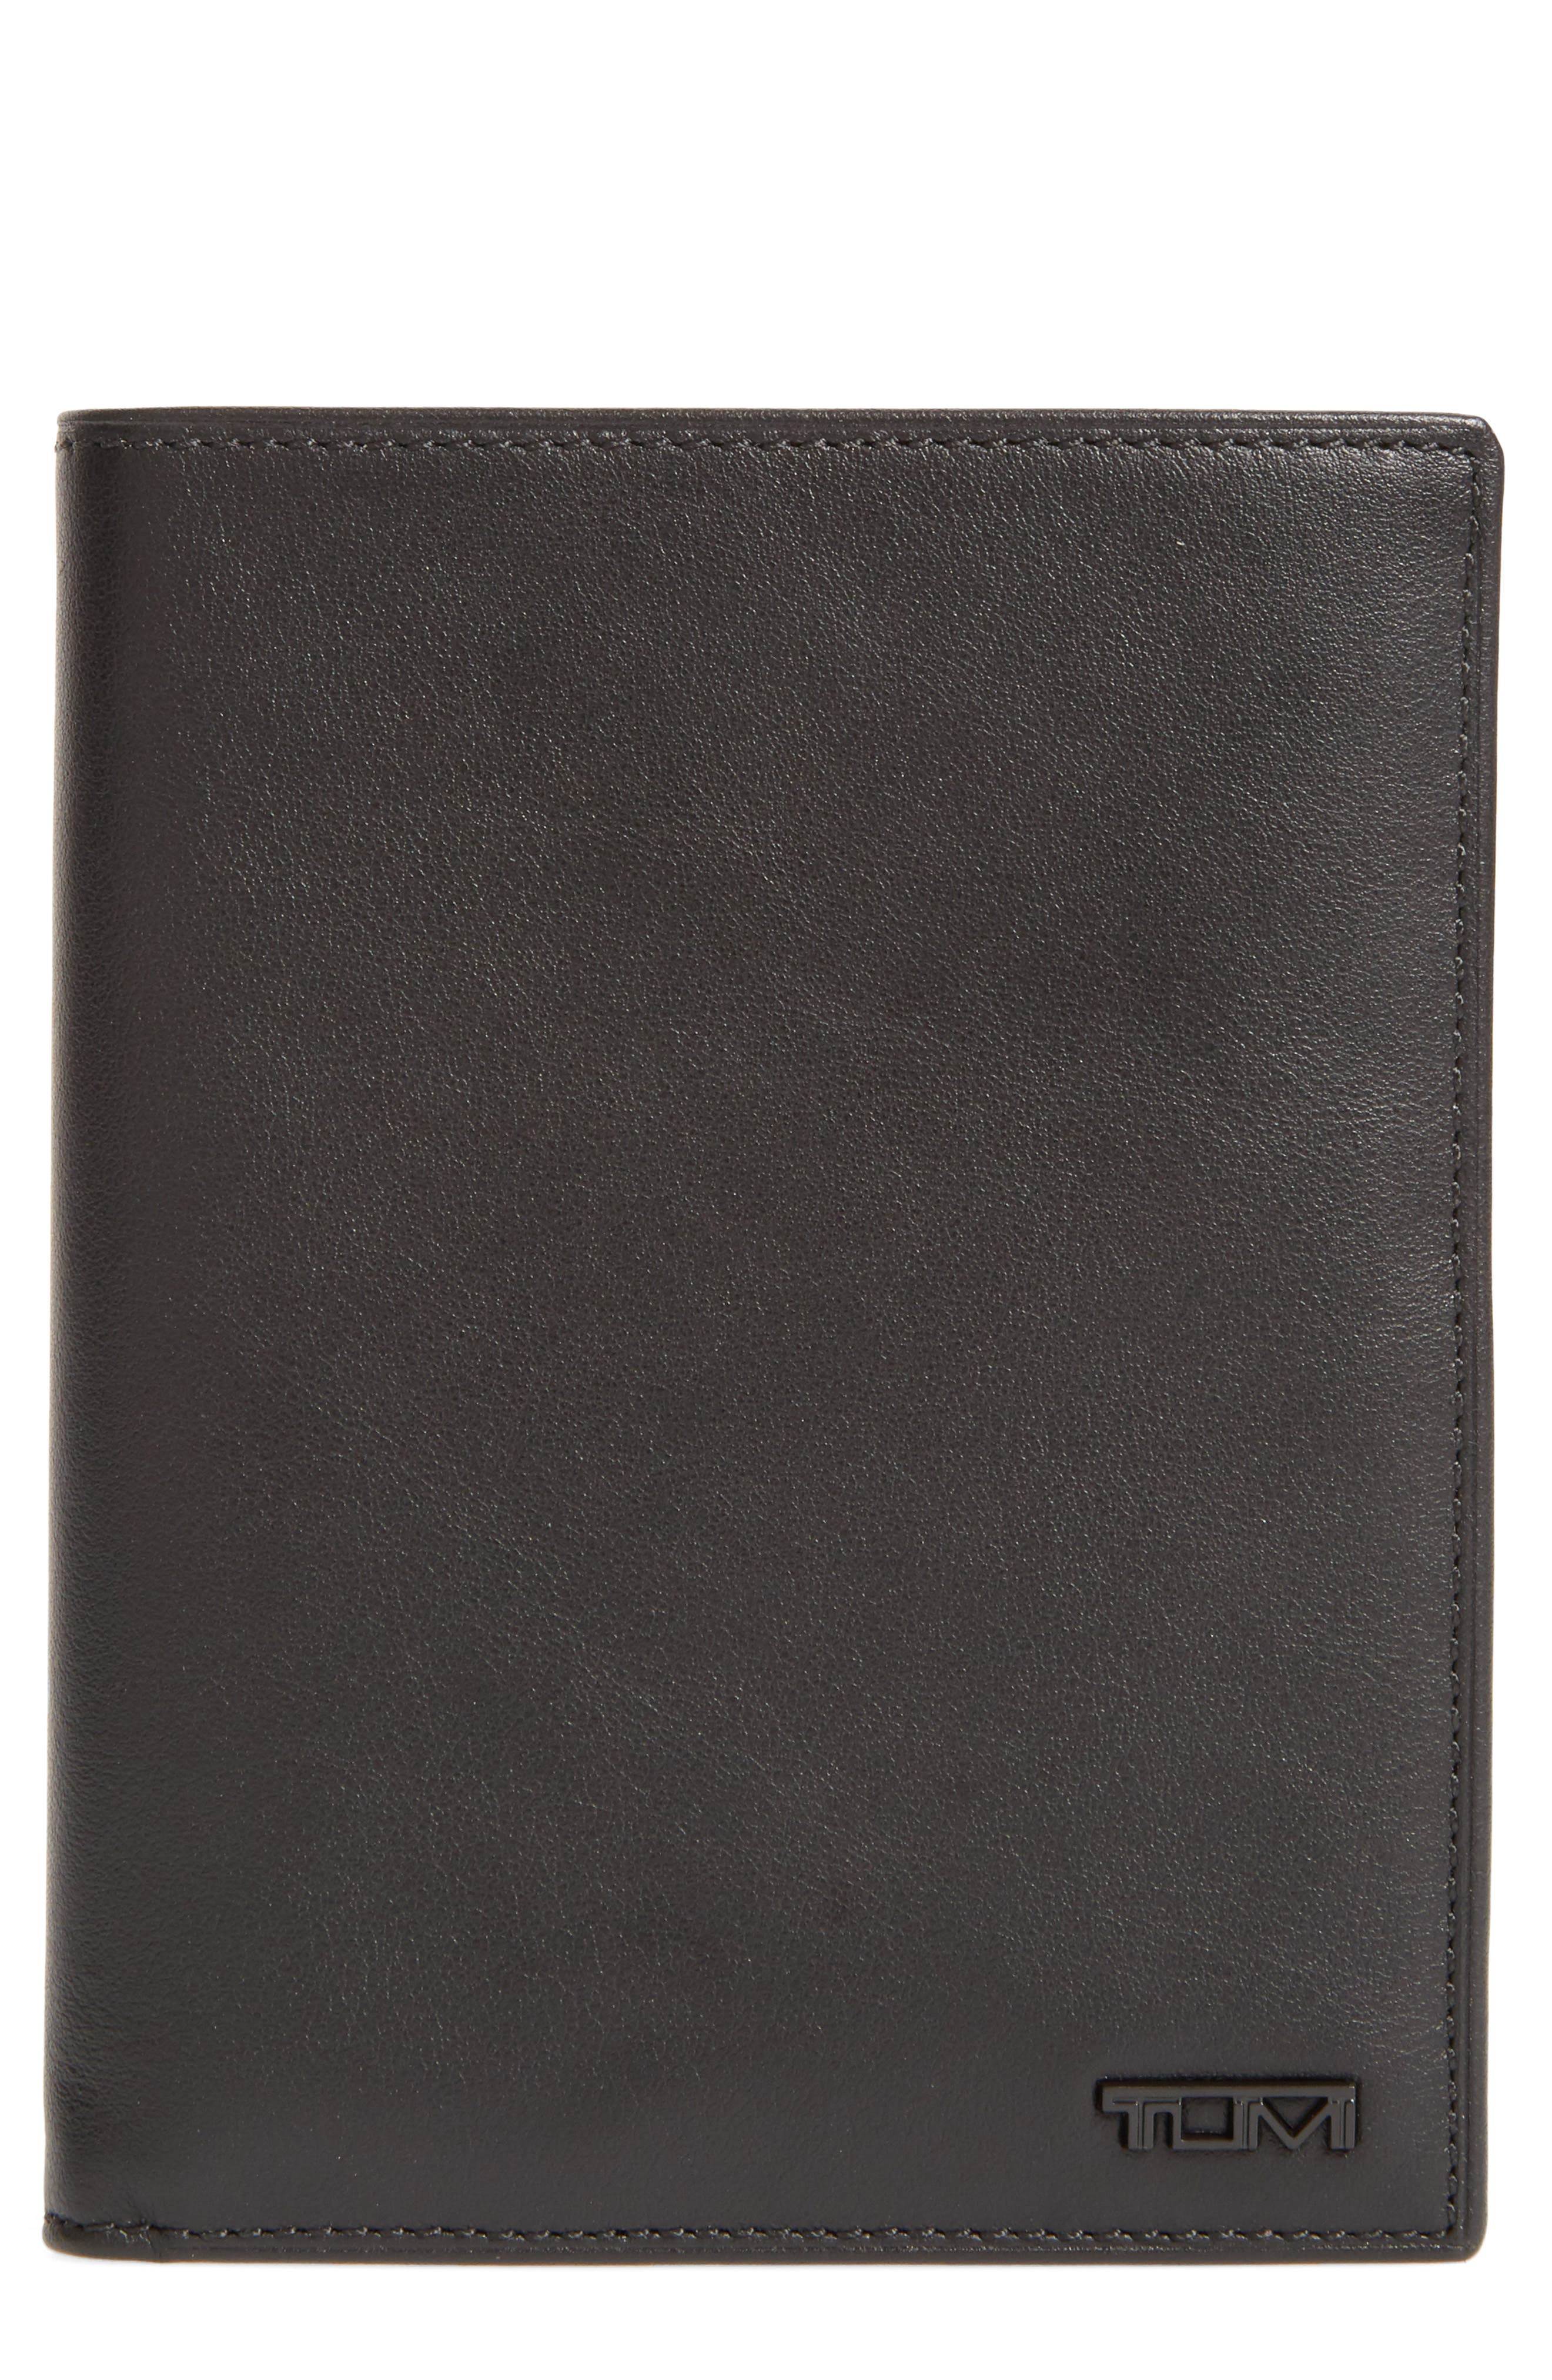 Alternate Image 1 Selected - Tumi Delta Passport Case